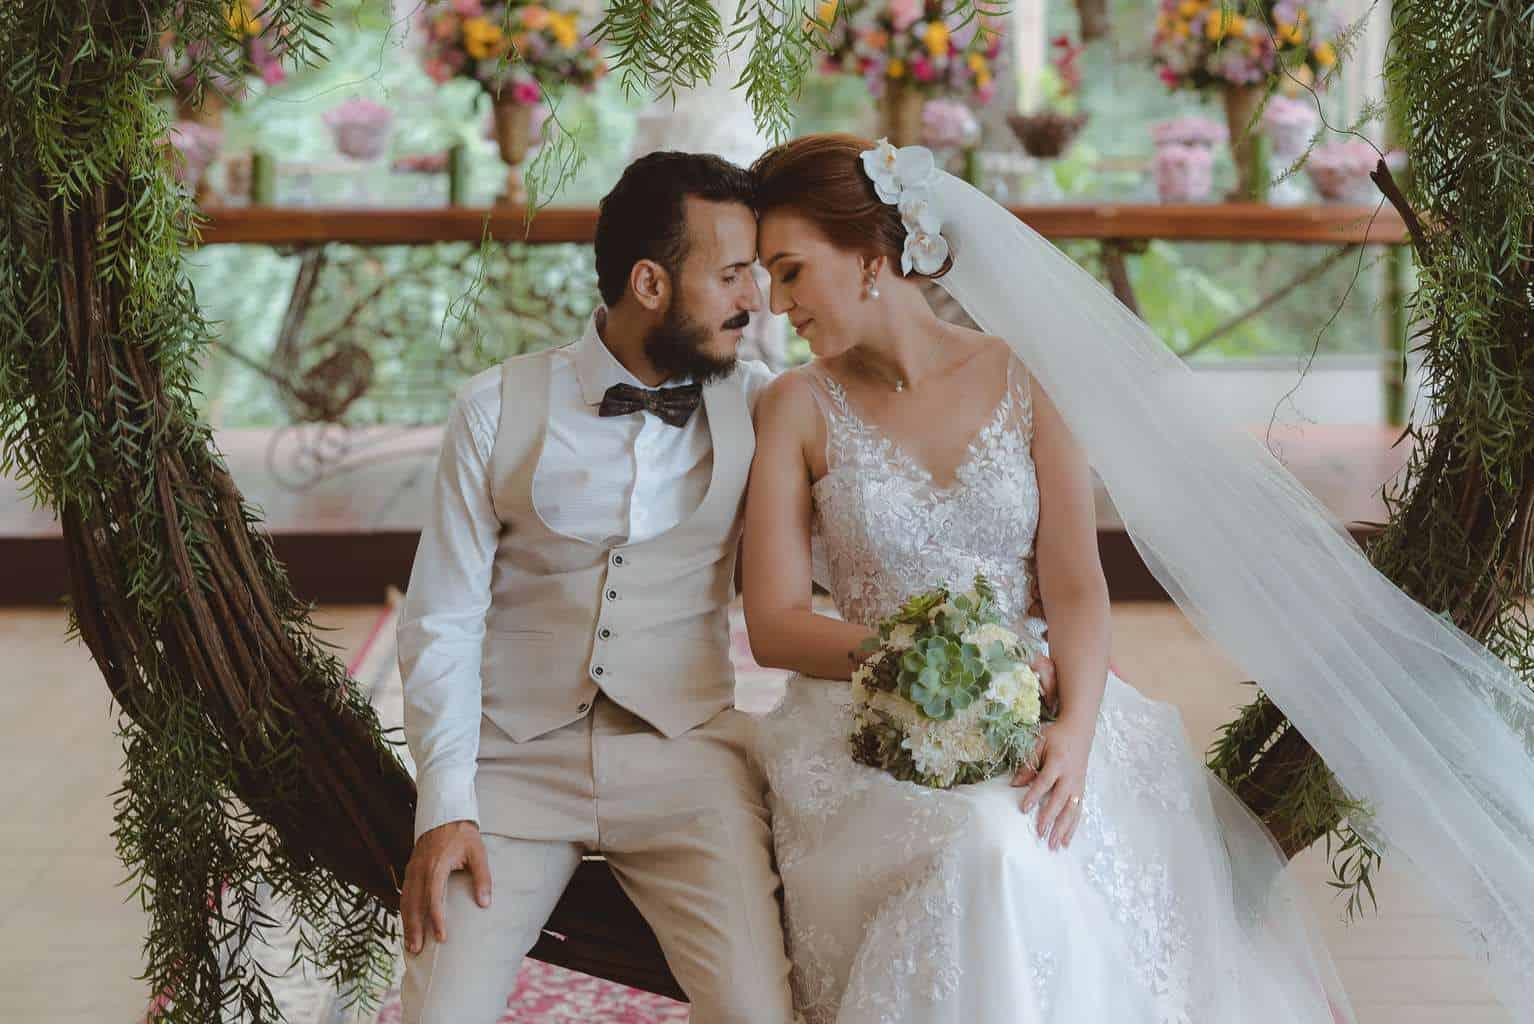 casamento-ao-ar-livre-casamento-boho-casamento-geek-casamento-rustico-casamento-Thais-e-Pedro-Revoar-Fotografia-Villa-Borghese-Eventos-56